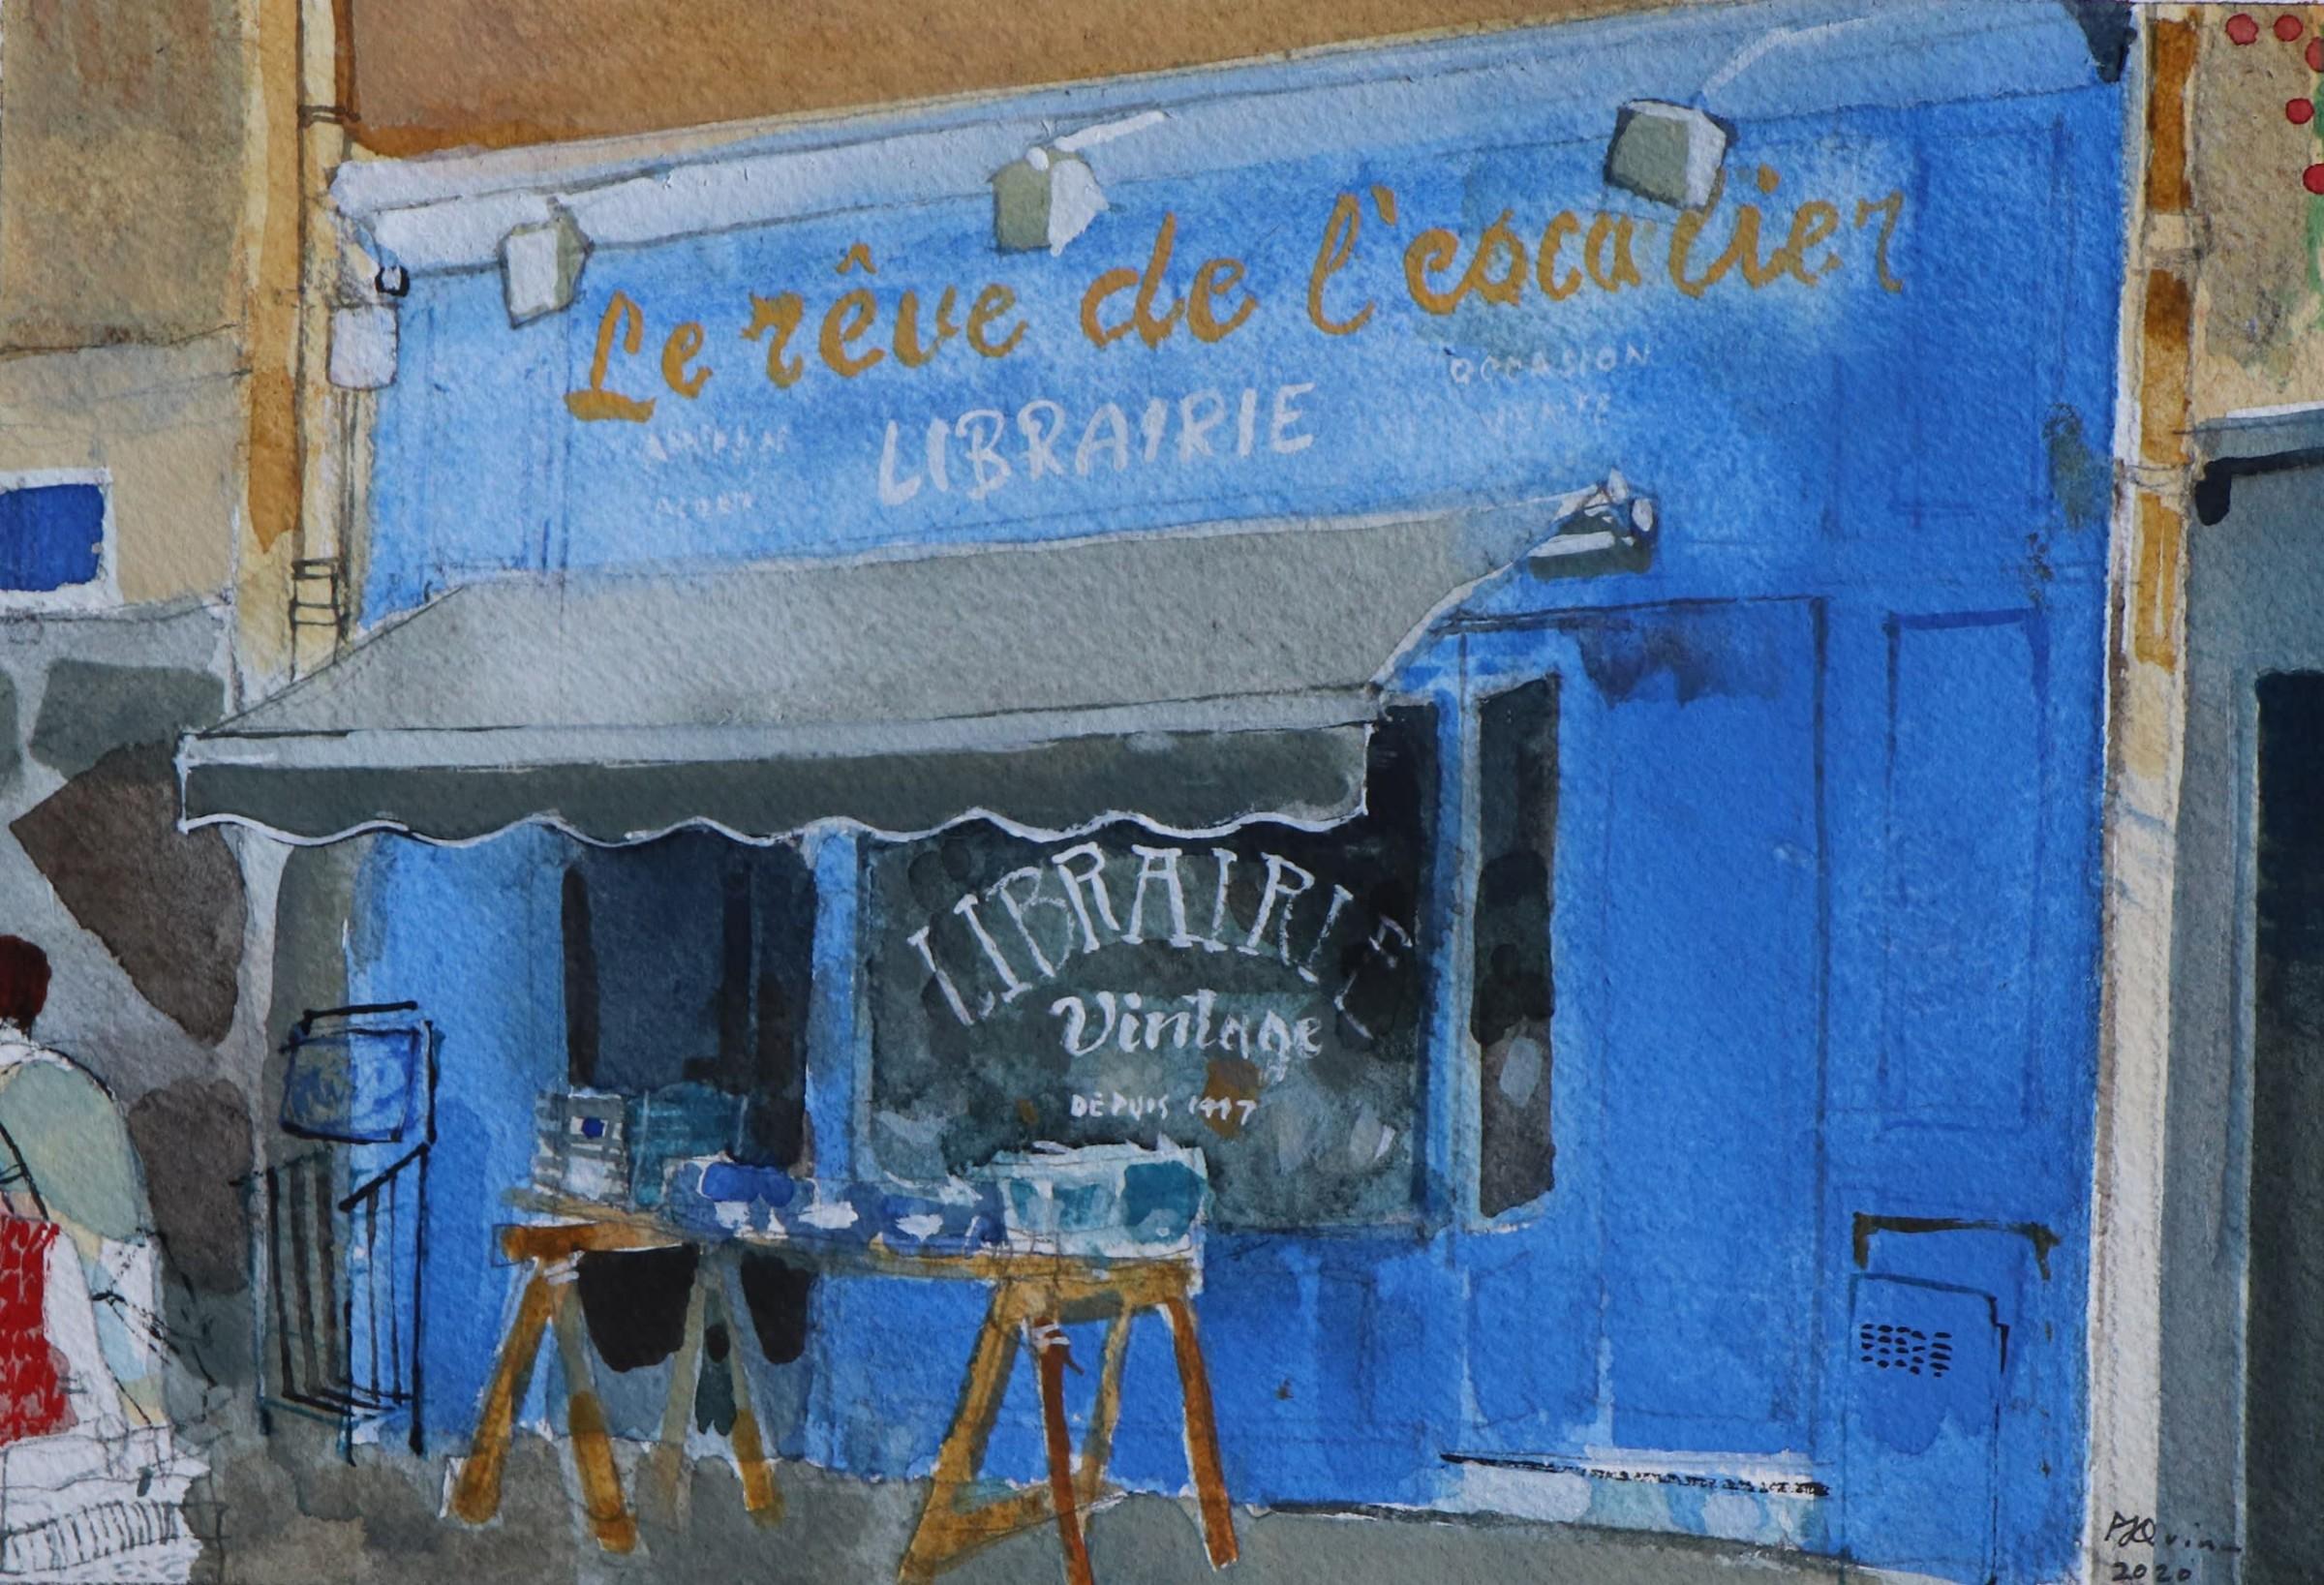 "<span class=""link fancybox-details-link""><a href=""/artists/96-peter-quinn/works/12297-peter-quinn-rouen-bookshop/"">View Detail Page</a></span><div class=""artist""><span class=""artist""><strong>Peter Quinn</strong></span></div><div class=""title""><em>Rouen, Bookshop</em></div><div class=""medium"">watercolour on paper</div><div class=""dimensions"">Frame: 36 x 43 cm<br /> </div><div class=""price"">£425.00</div>"